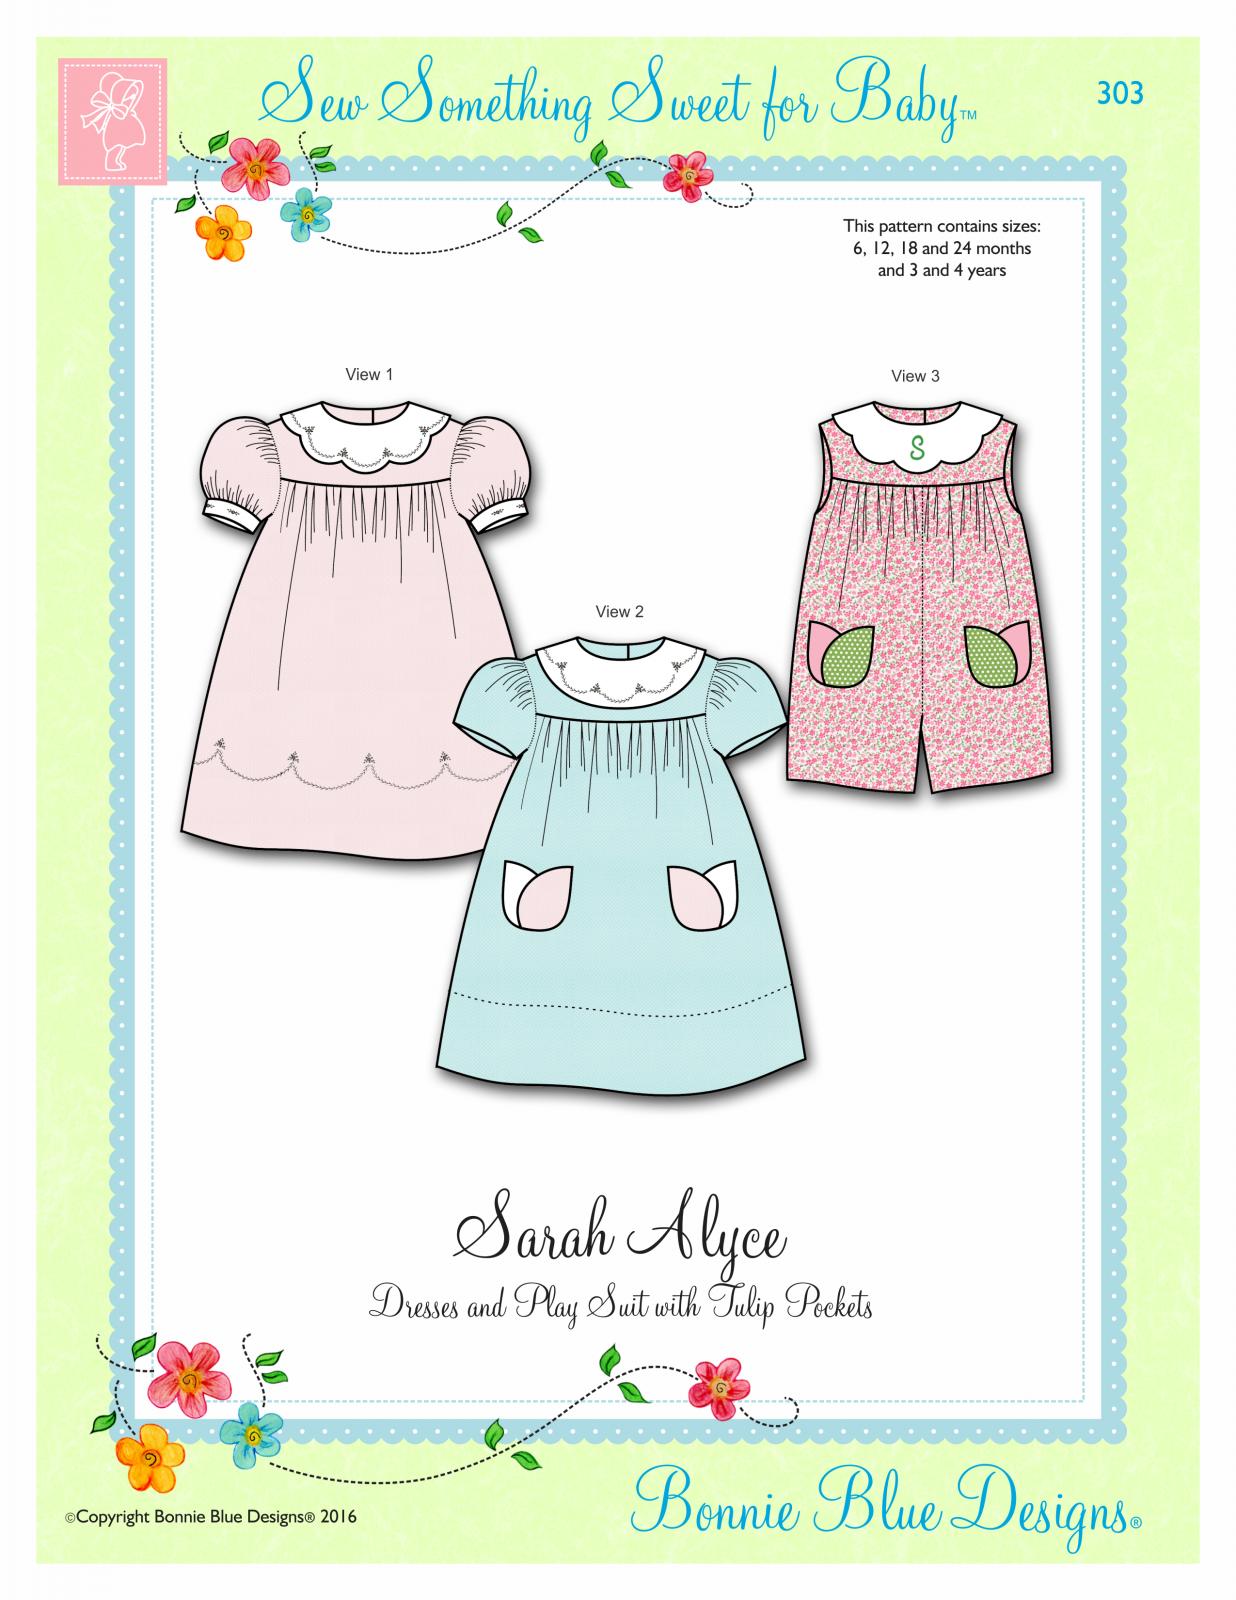 Bonnie Blue Designs  Sarah Alyce 303